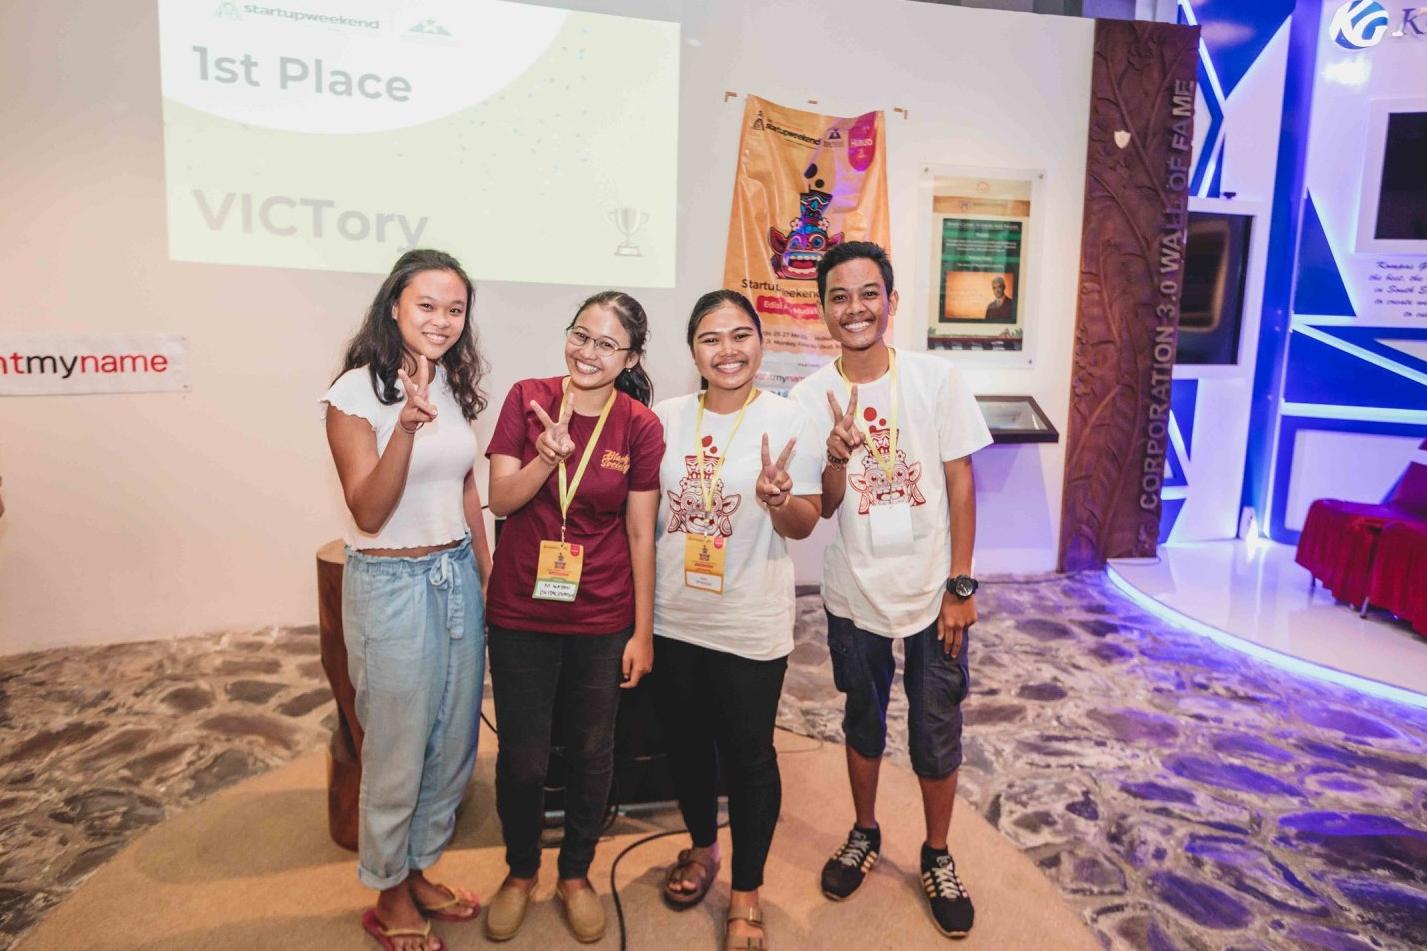 Image Source: Hubud & Startup Weekend Bali